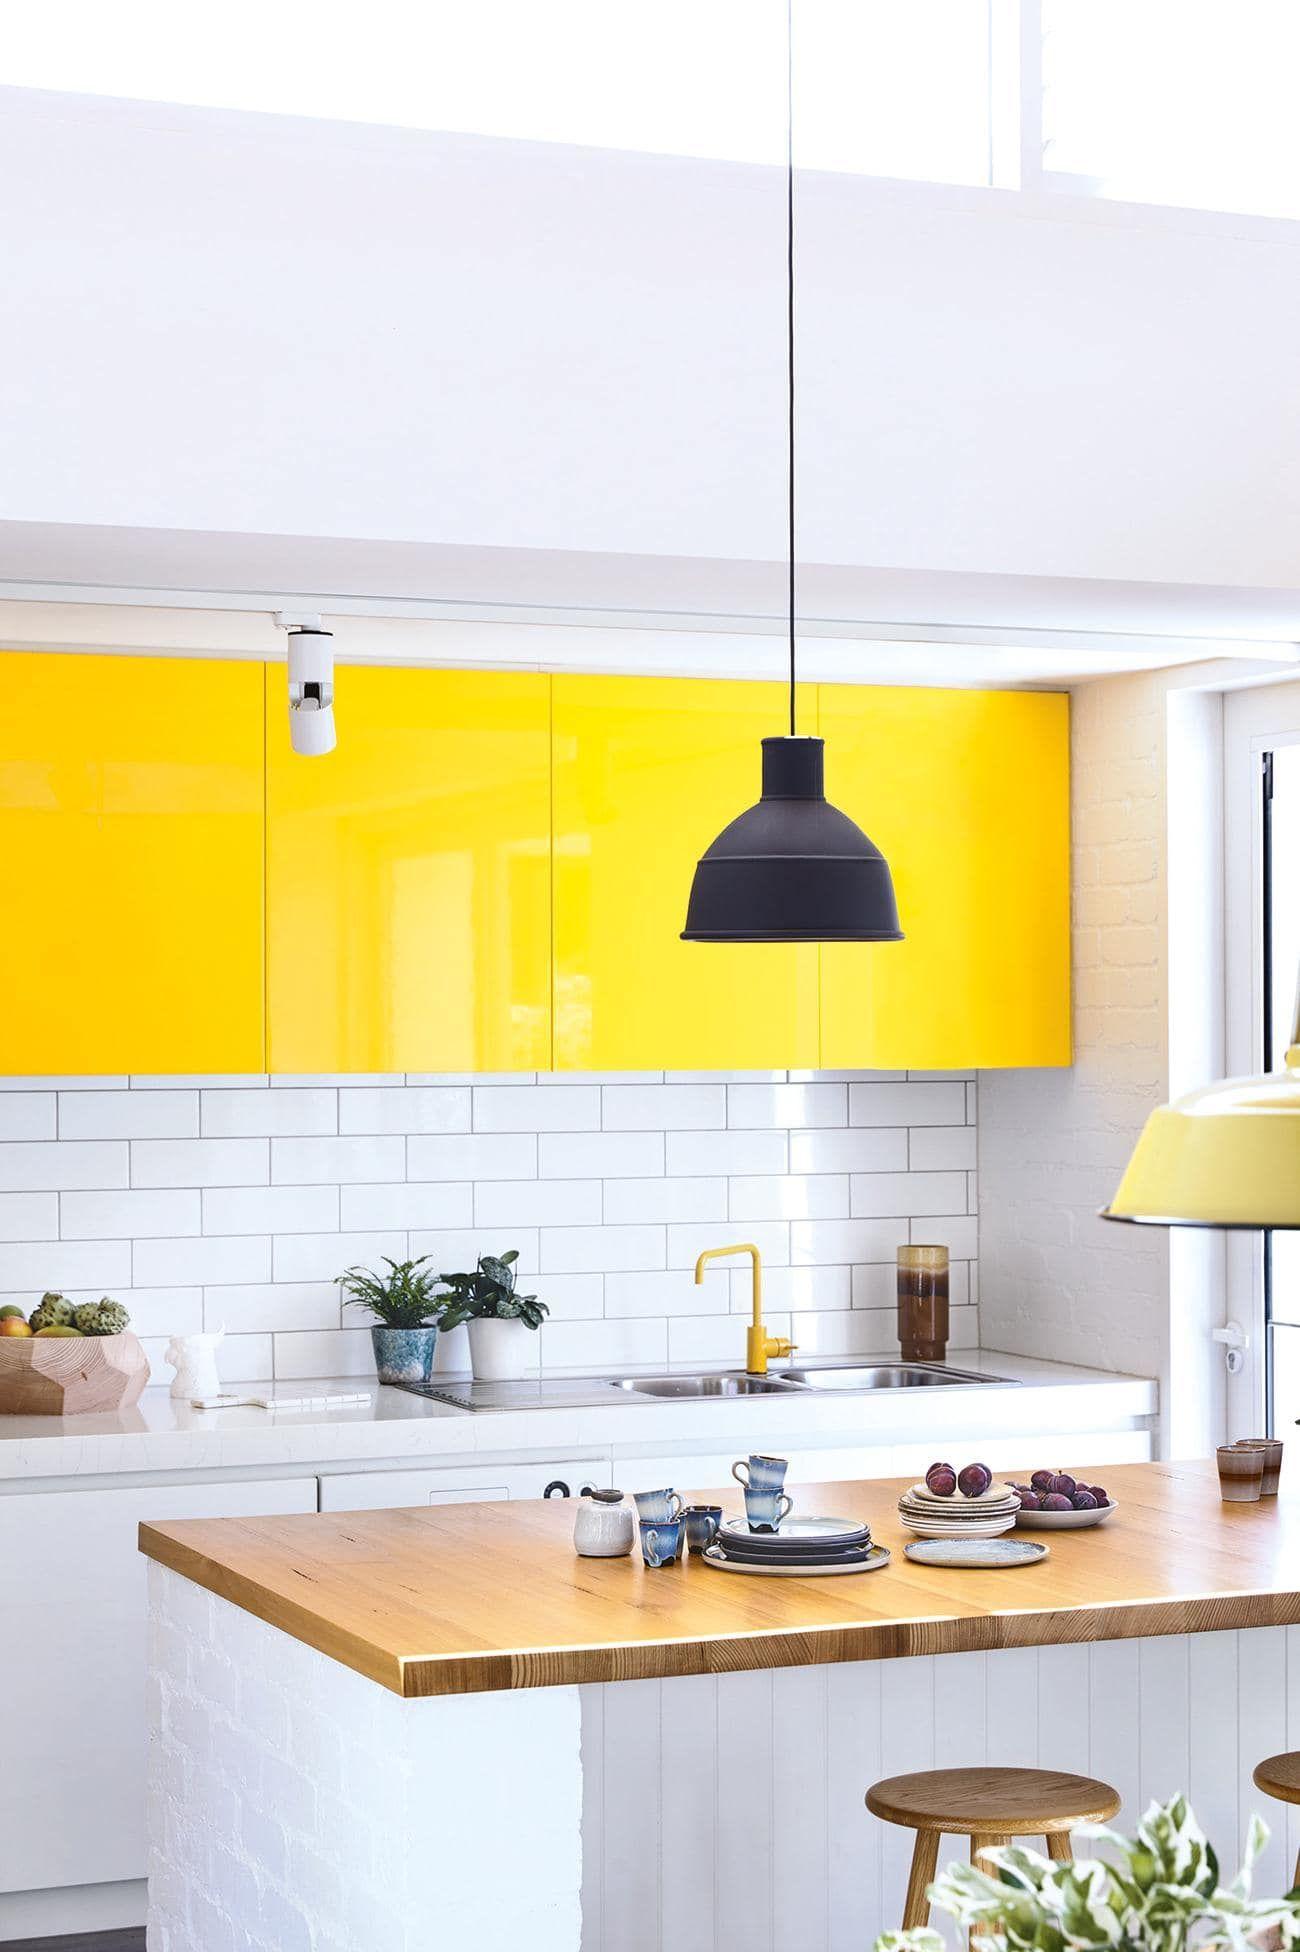 Pin By Milica Zivanovic On Kitchen Ideas Yellow Kitchen Cabinets